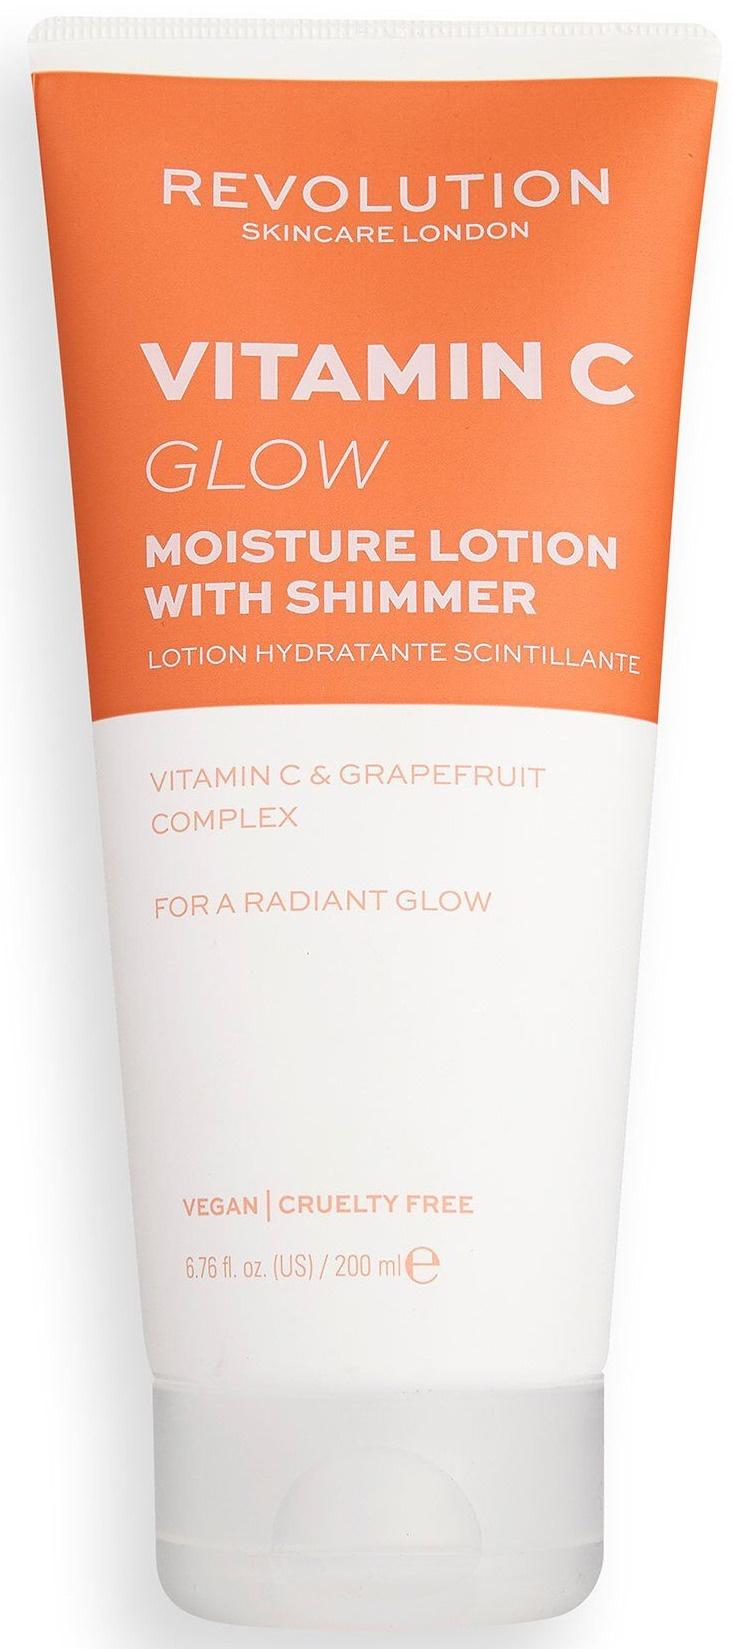 Revolution Skincare Vitamin C Glow Shimmer Moisture Lotion